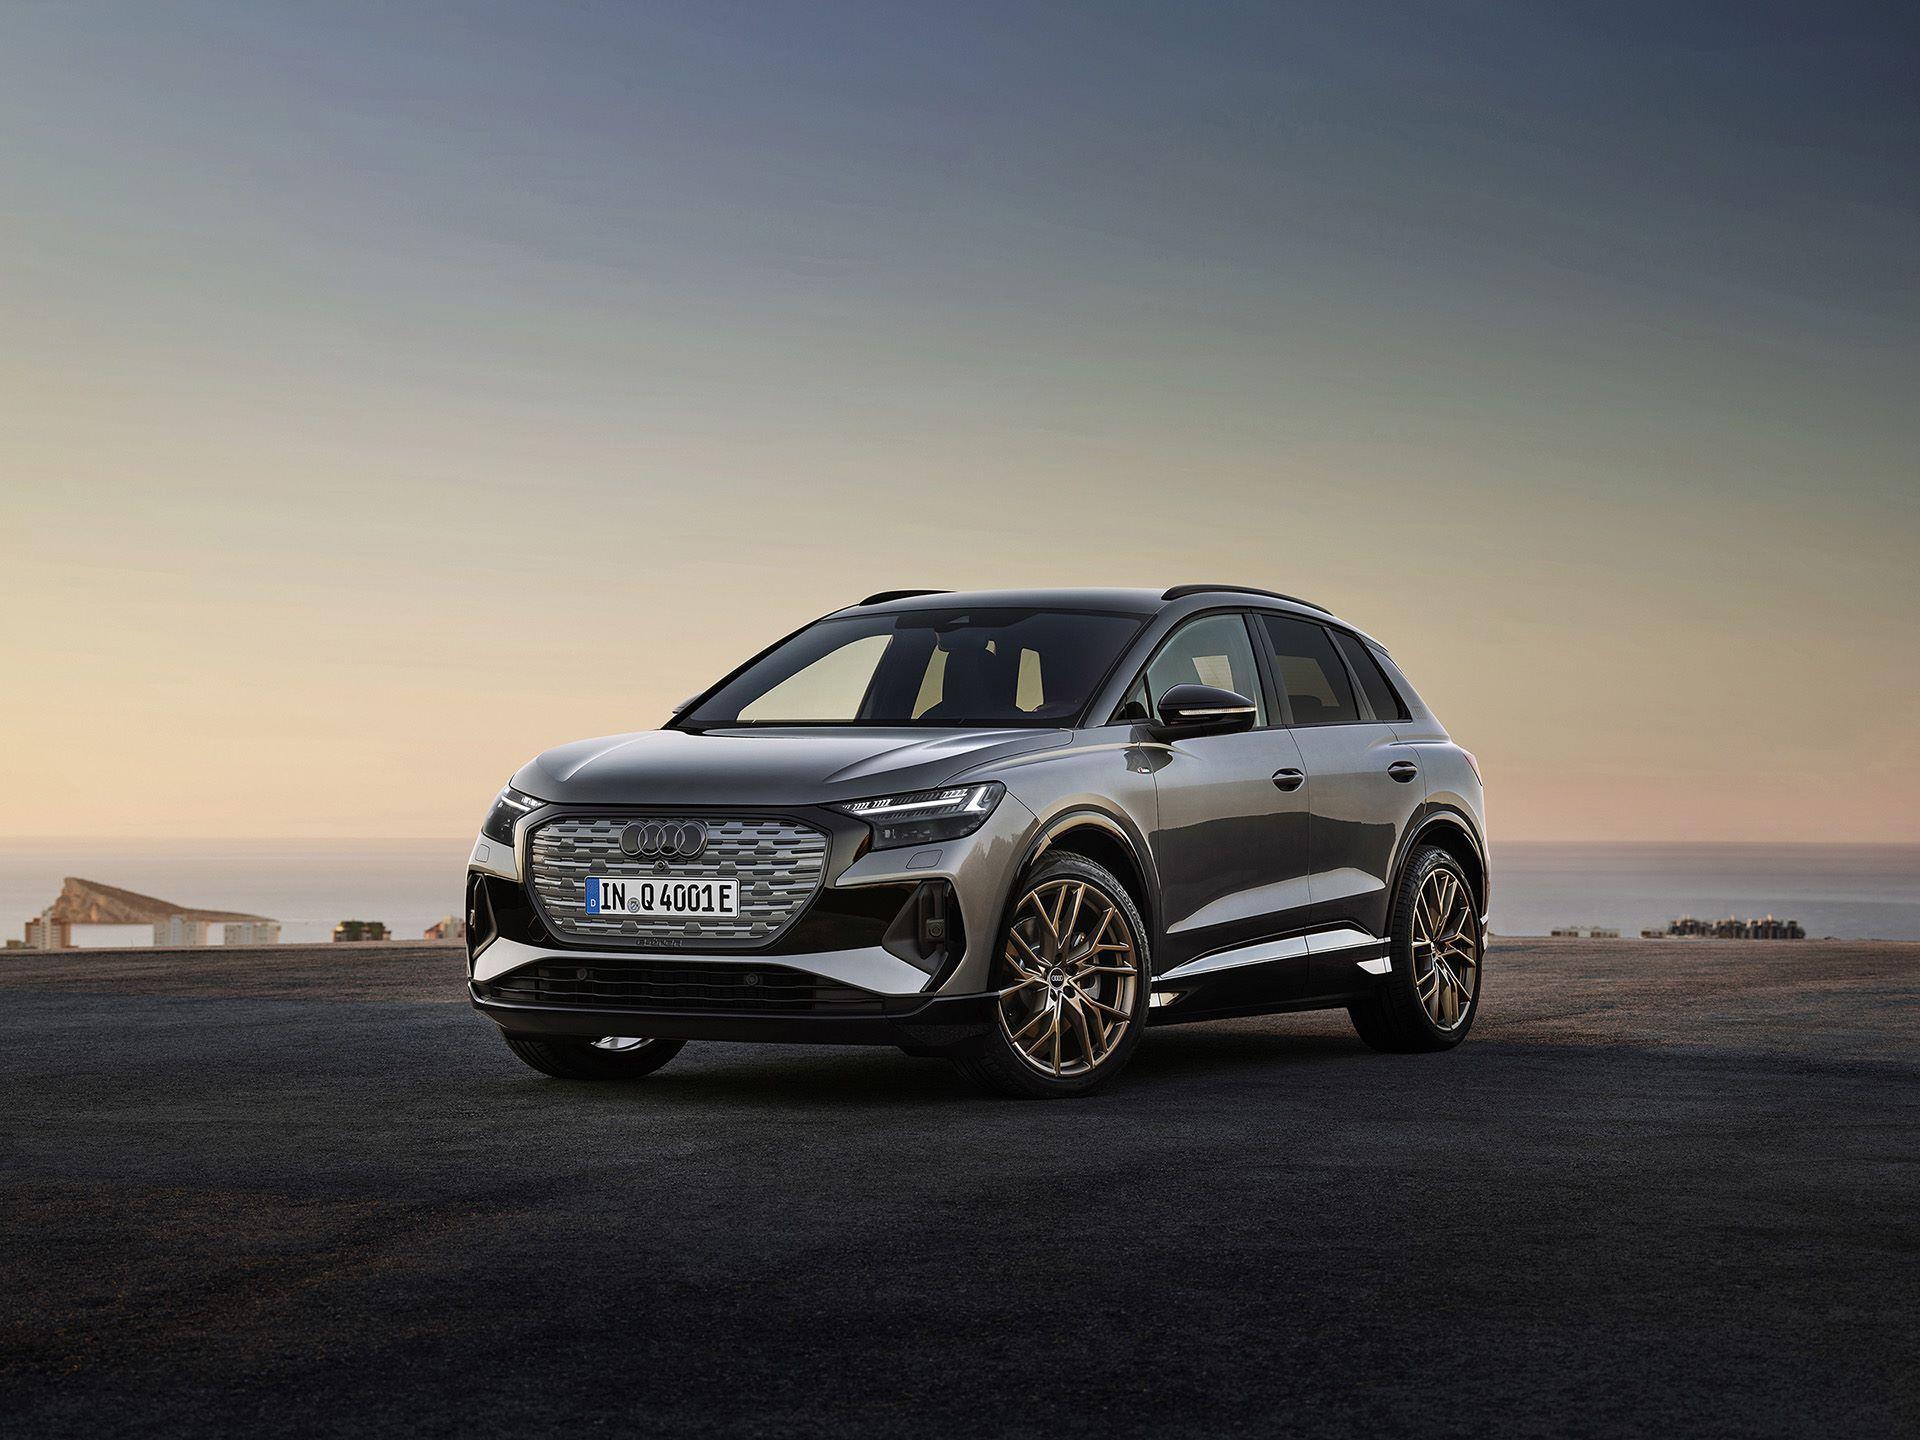 Audi-Q4-e-tron-and-Q4-e-tron-Sportback-21